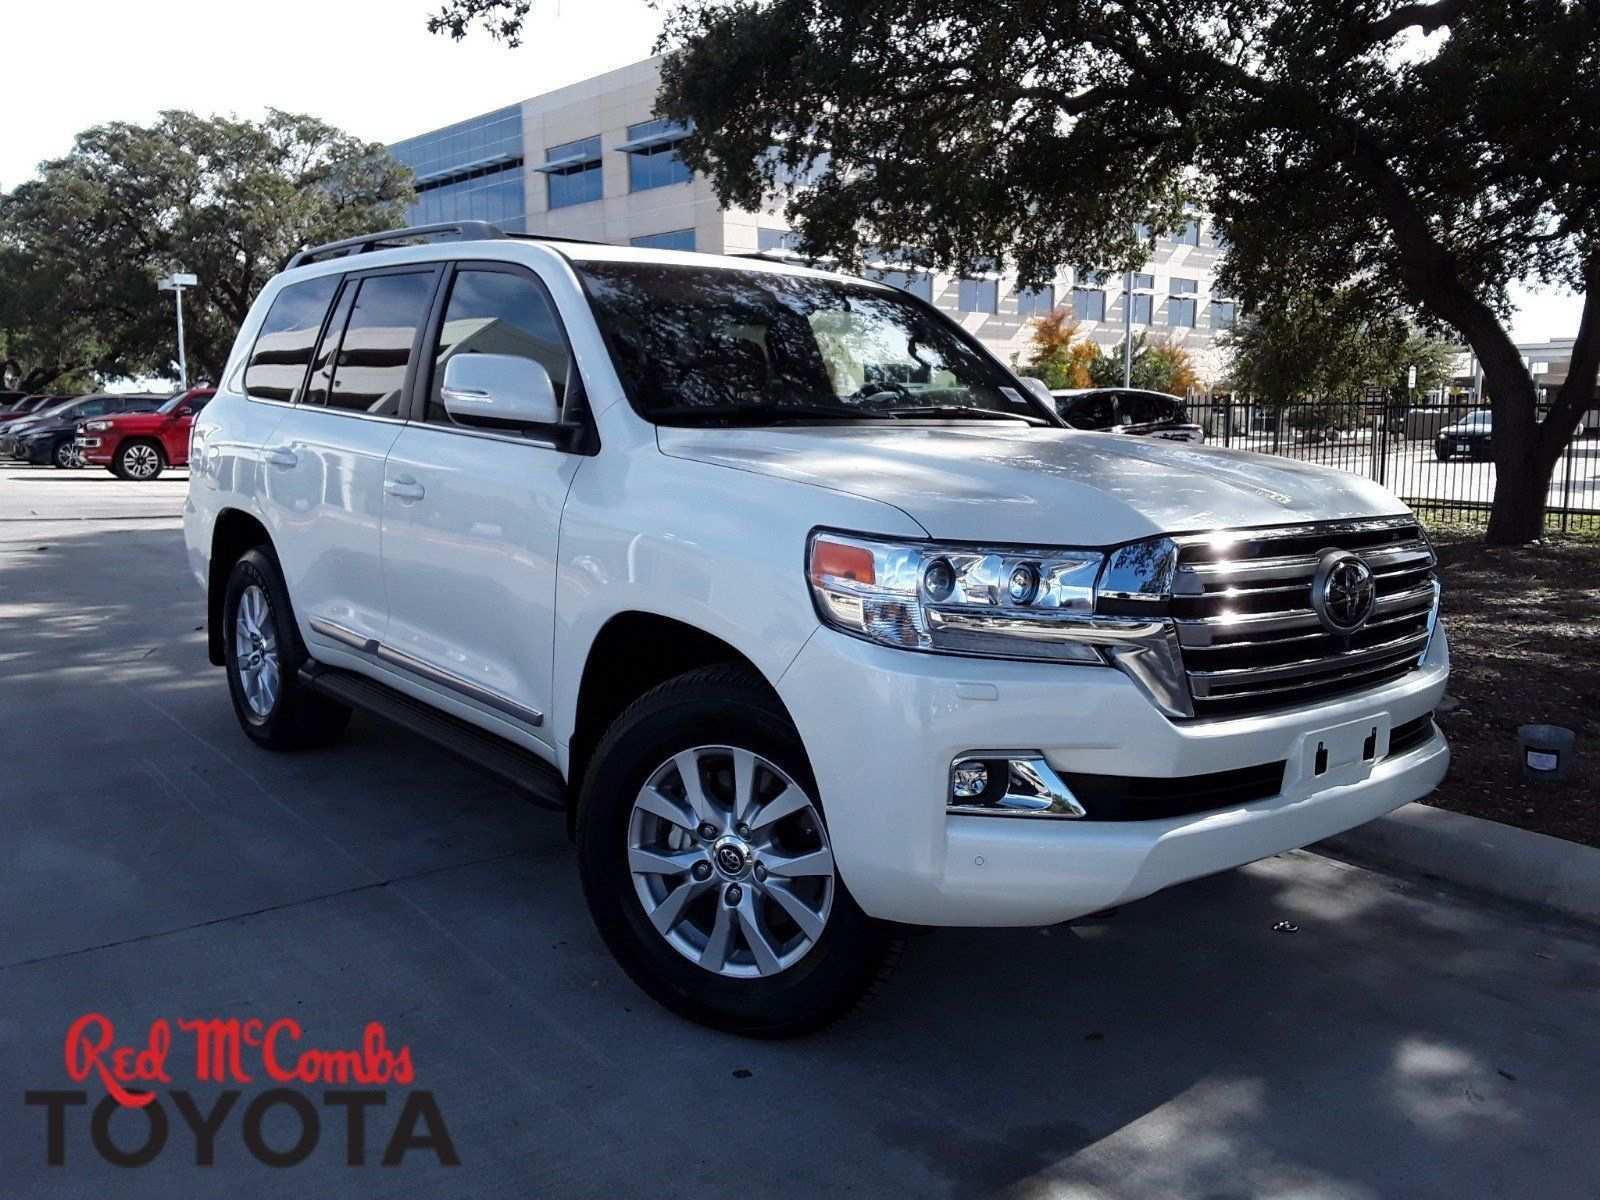 92 Concept of New Toyota Land Cruiser 2019 Rumor Picture by New Toyota Land Cruiser 2019 Rumor